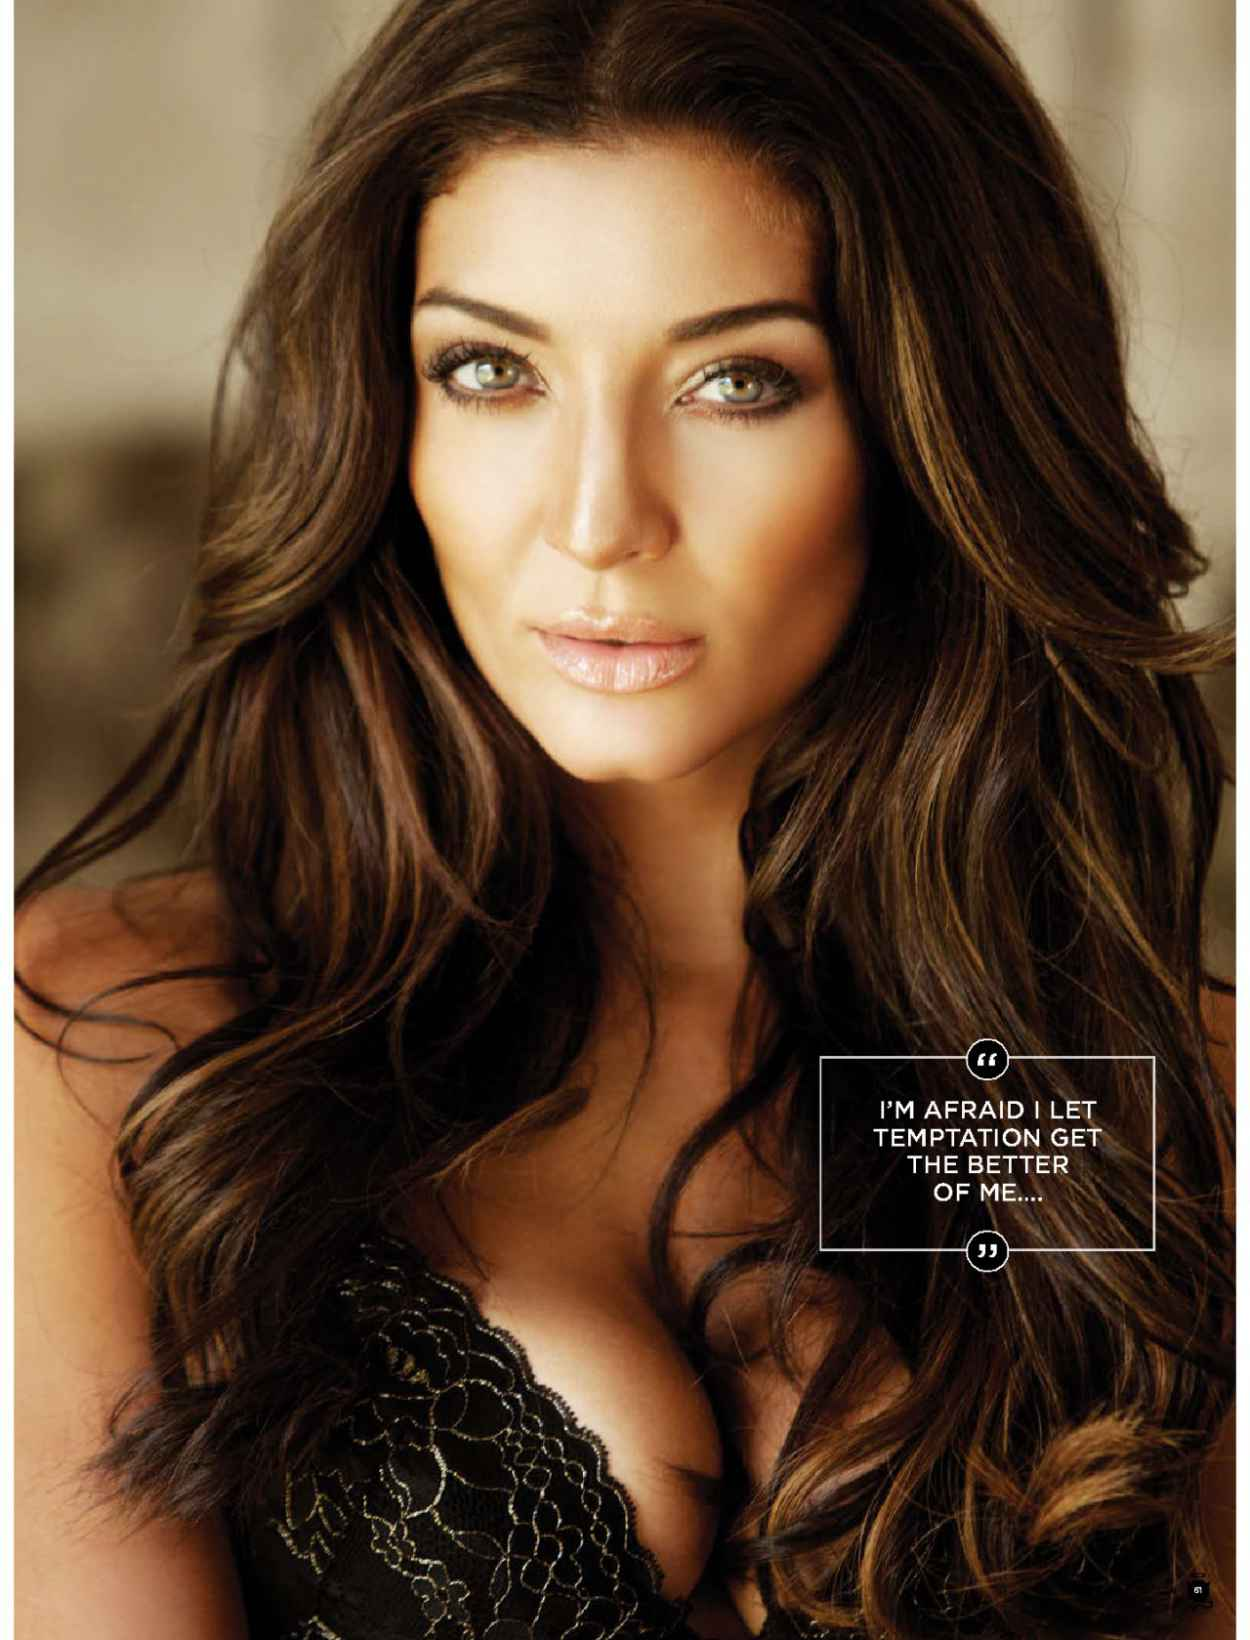 Jeannie de Gouveia - MAXIM Magazine (South Africa) - February 2015 Issue-1